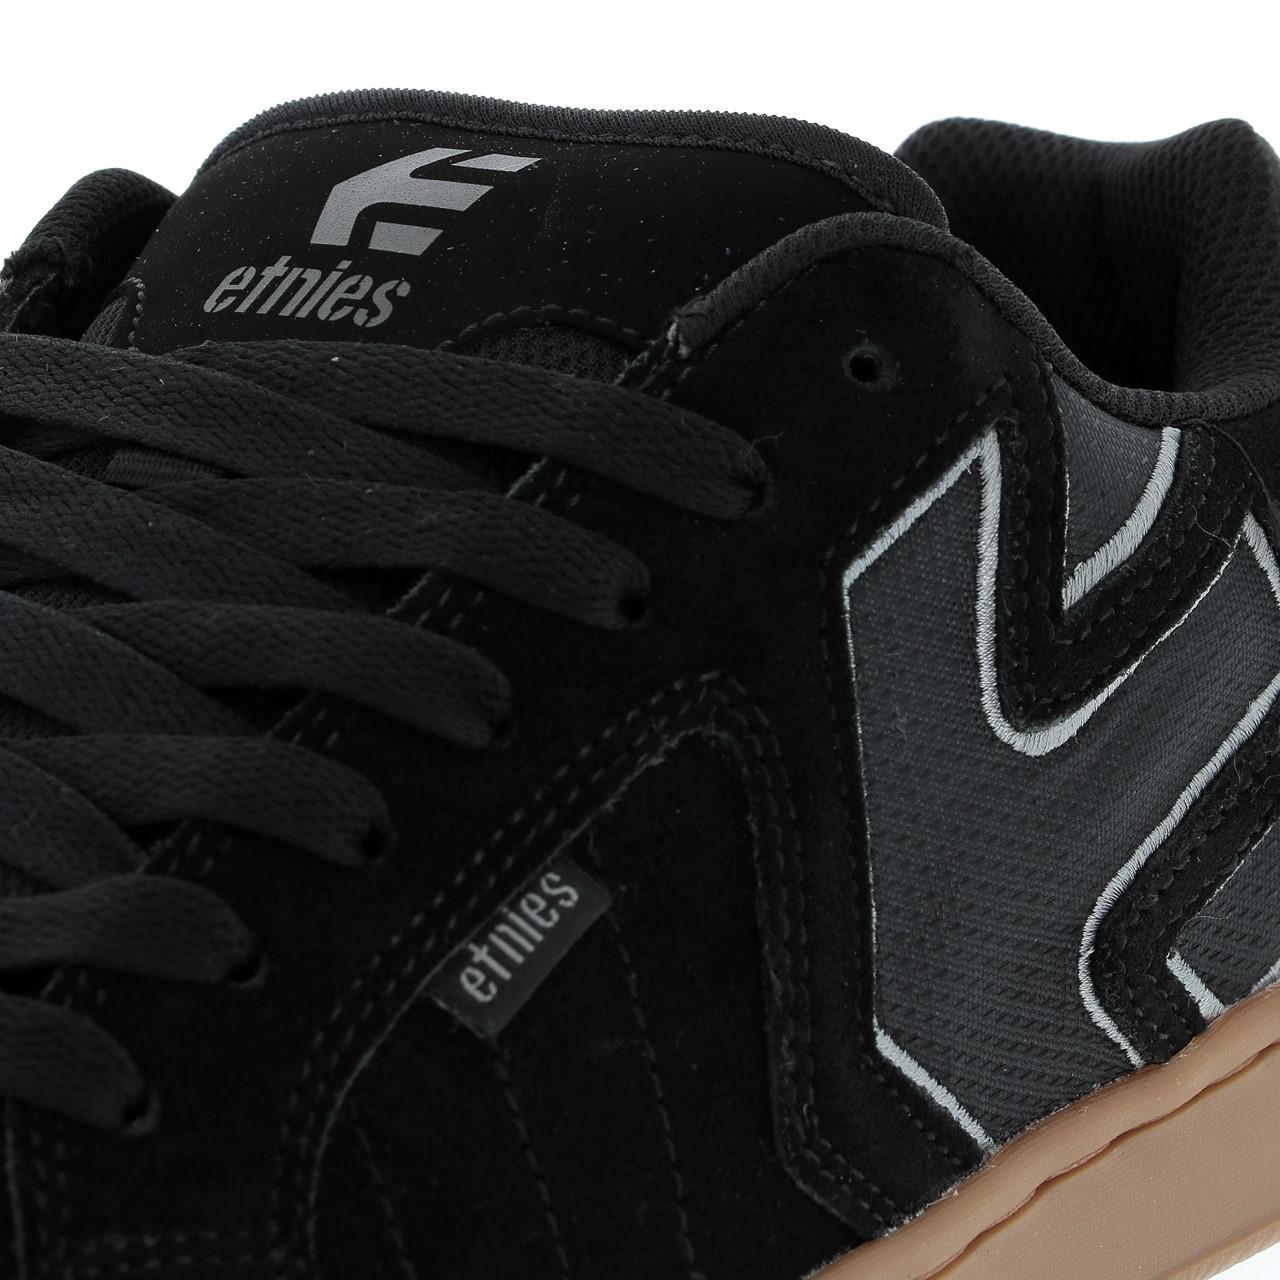 Shoes-Skateboard-Etnies-Fader-Black-Grey-Gum-Black-39127-New thumbnail 2